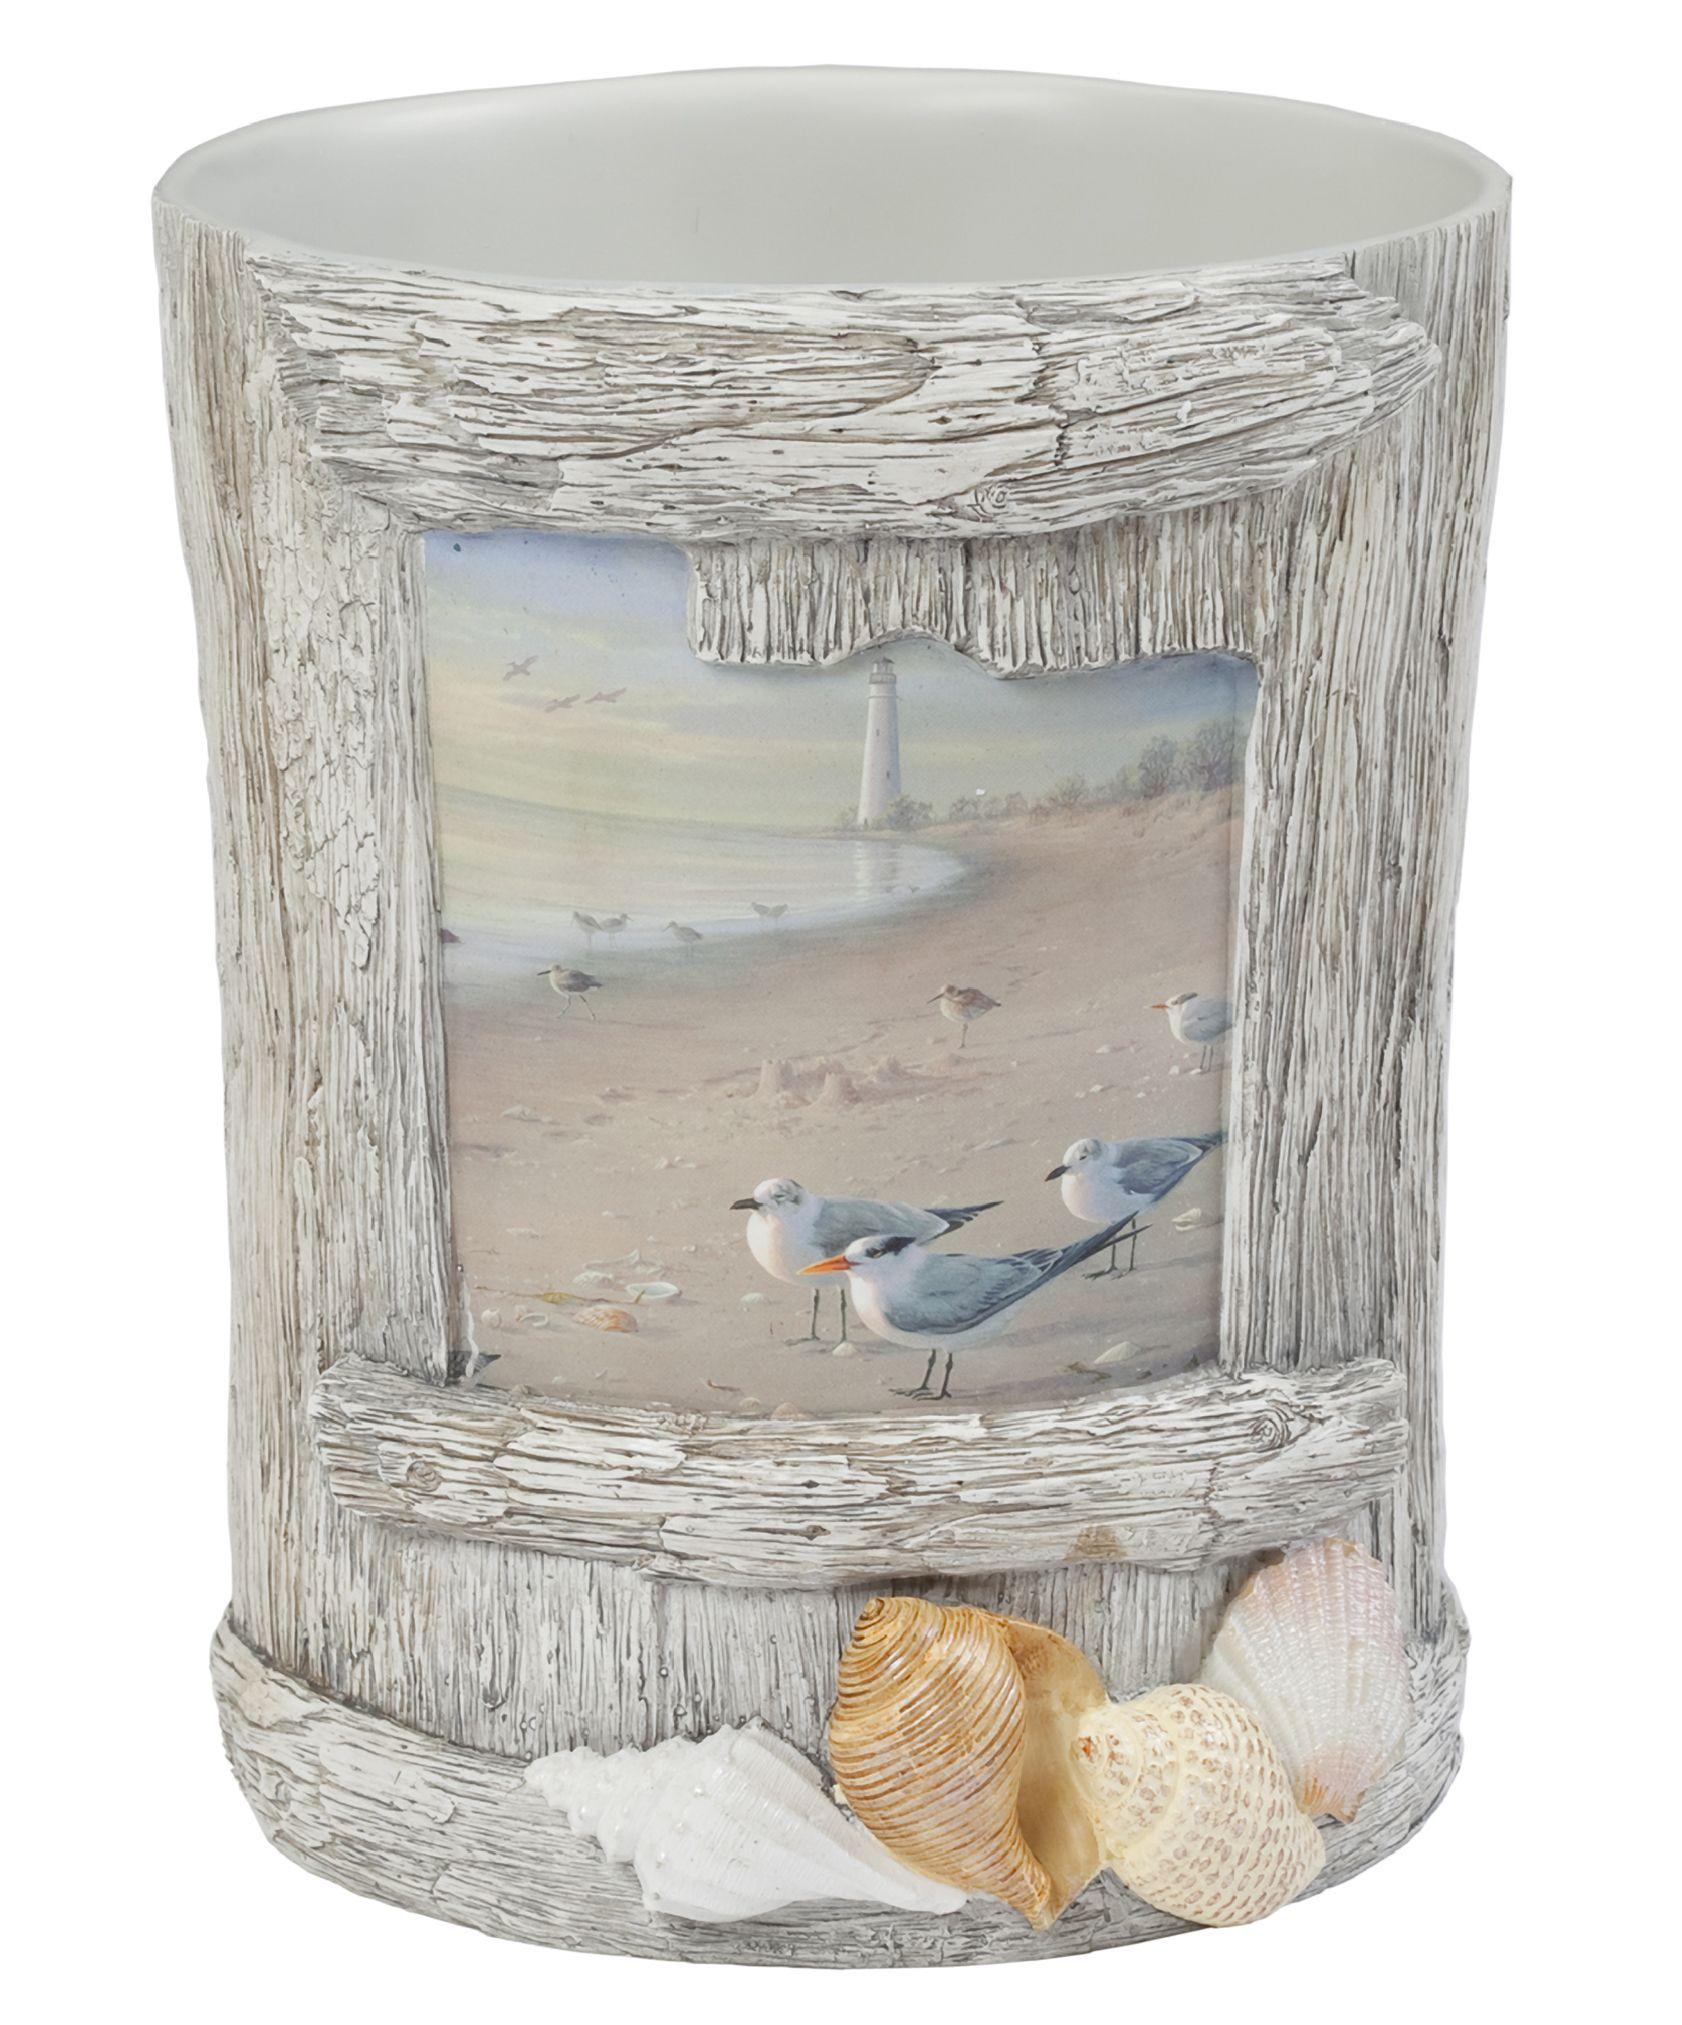 Ведра для мусора Ведро для мусора Creative Bath At The Beach vedro-dlya-musora-creative-bath-at-the-beach-ssha-kitay.jpg